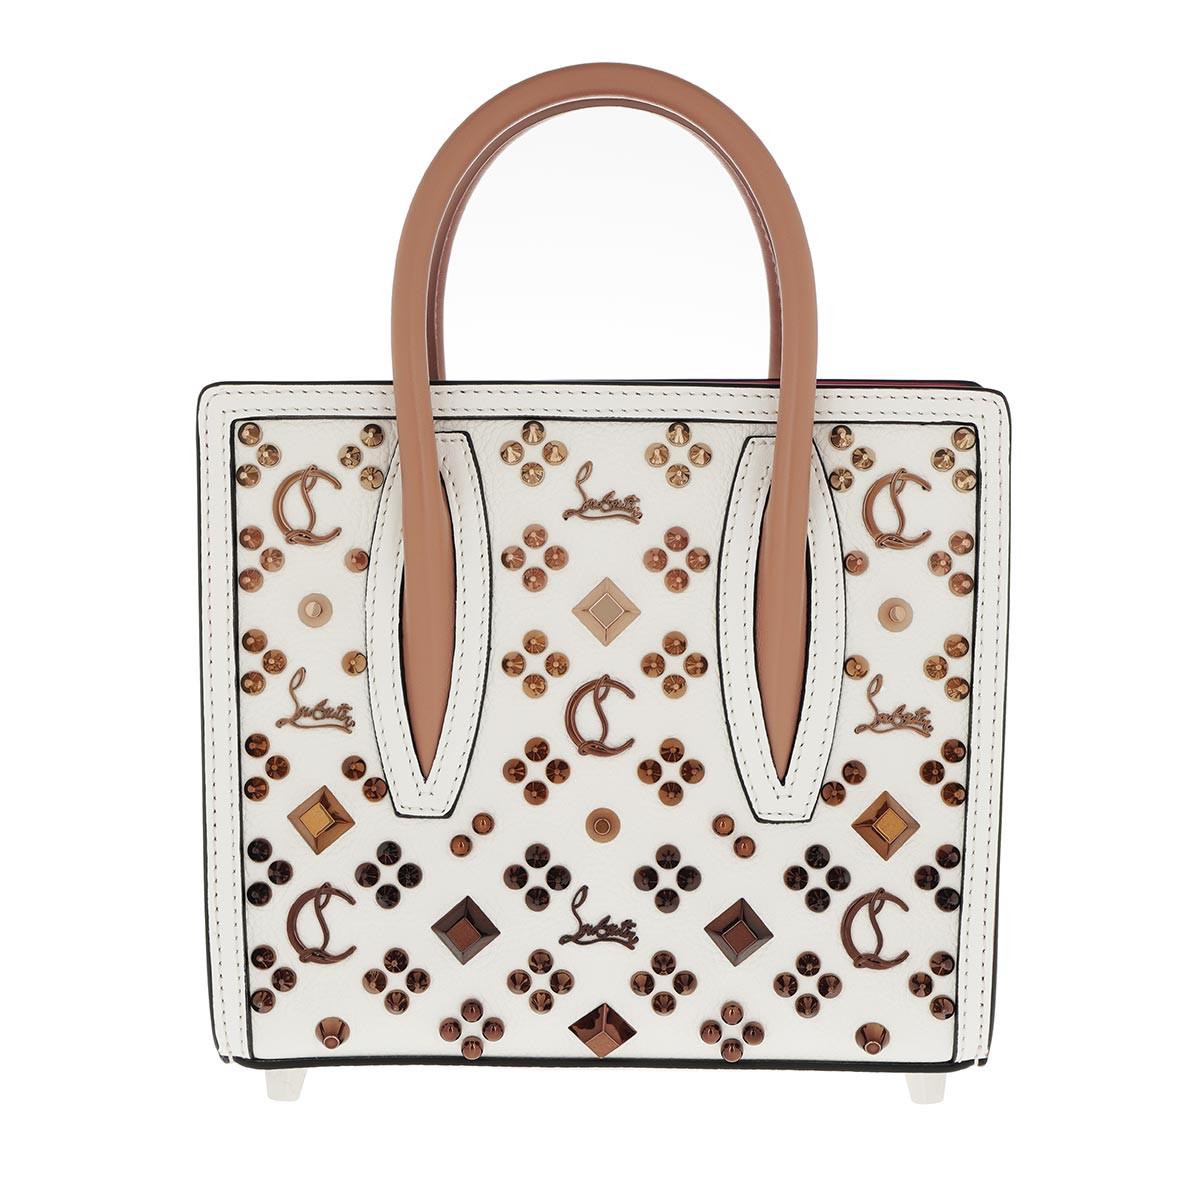 Christian Louboutin Tote - Paloma S Mini Bag Leather White - in weiß - für Damen